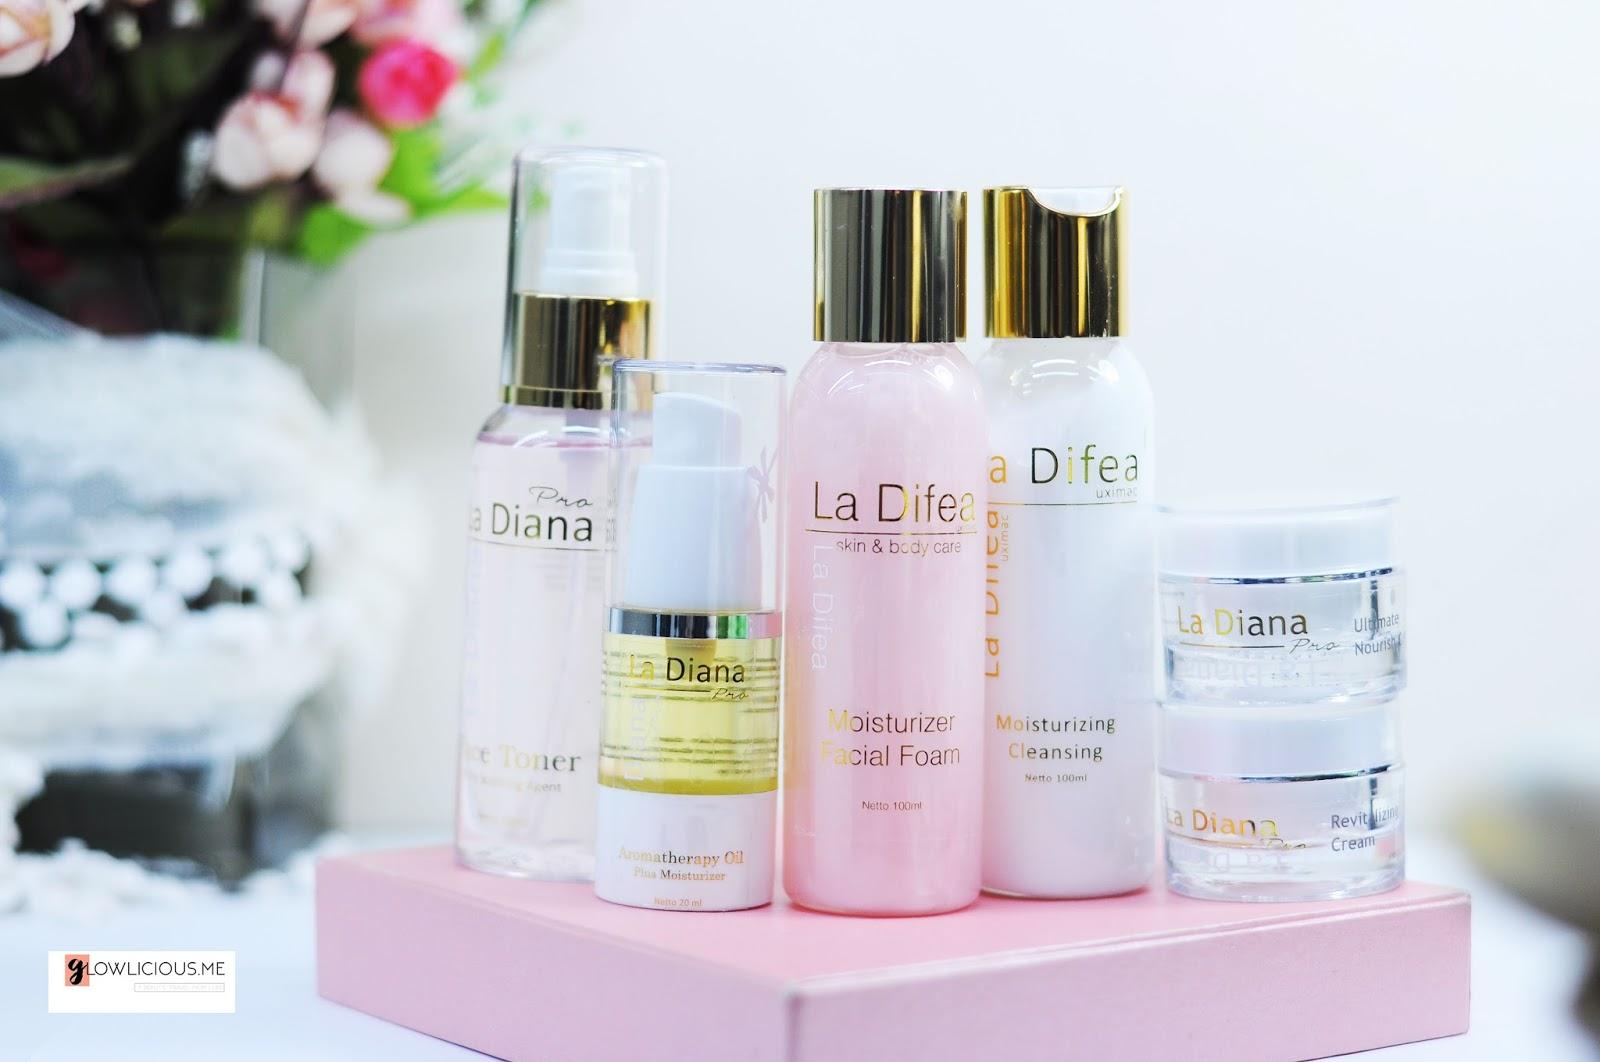 Merawat Kulit Wajah Menggunakan Rangkaian La Diana Skincare (Since 1955)